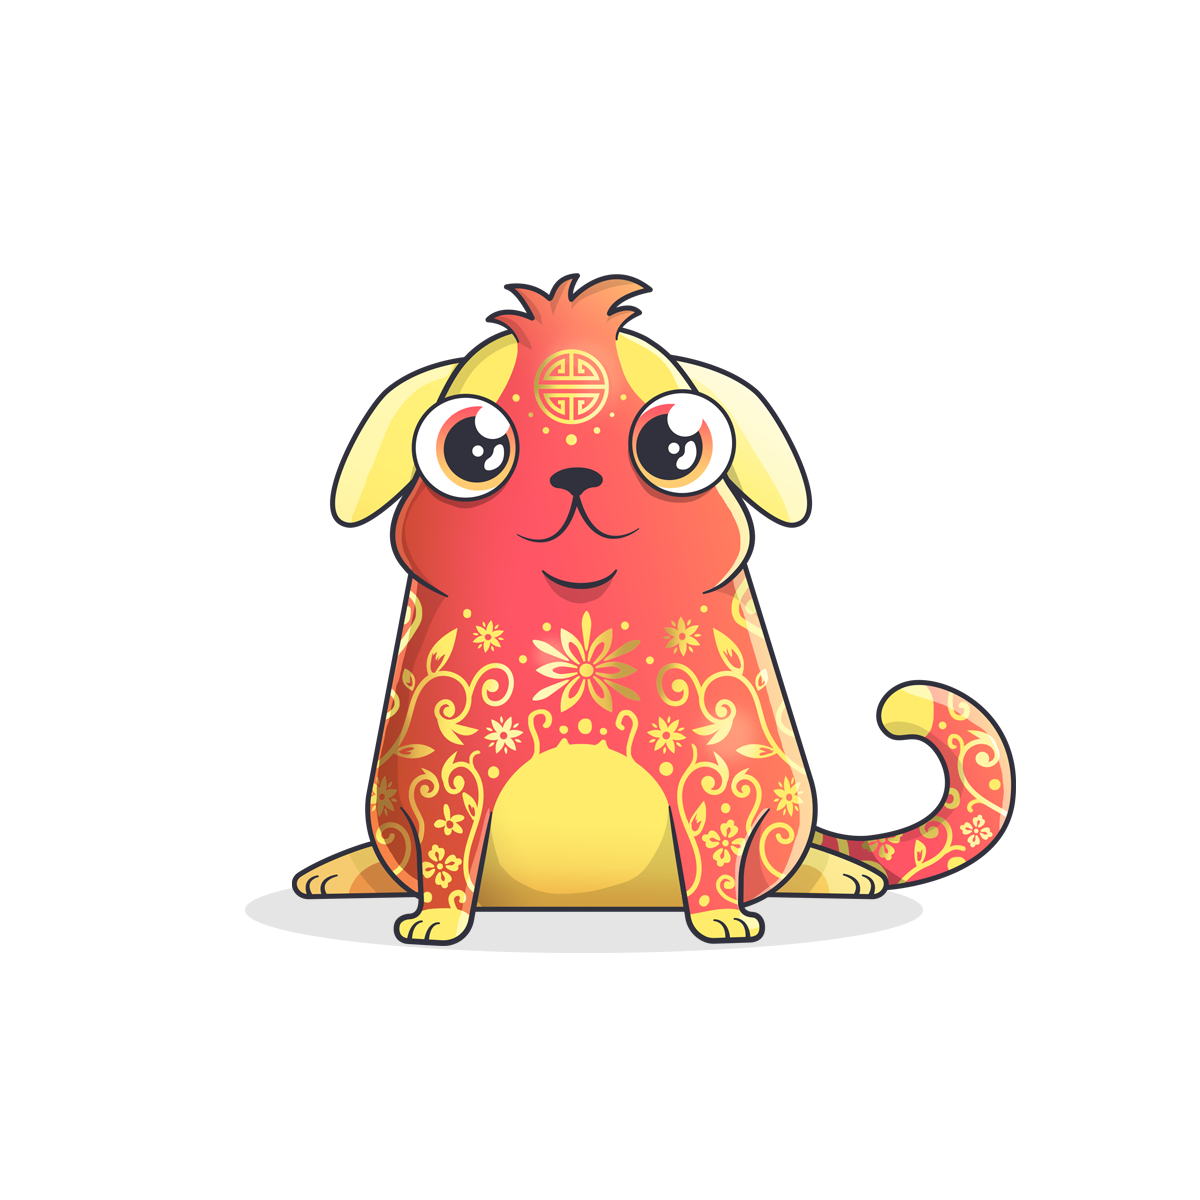 DogCat pic